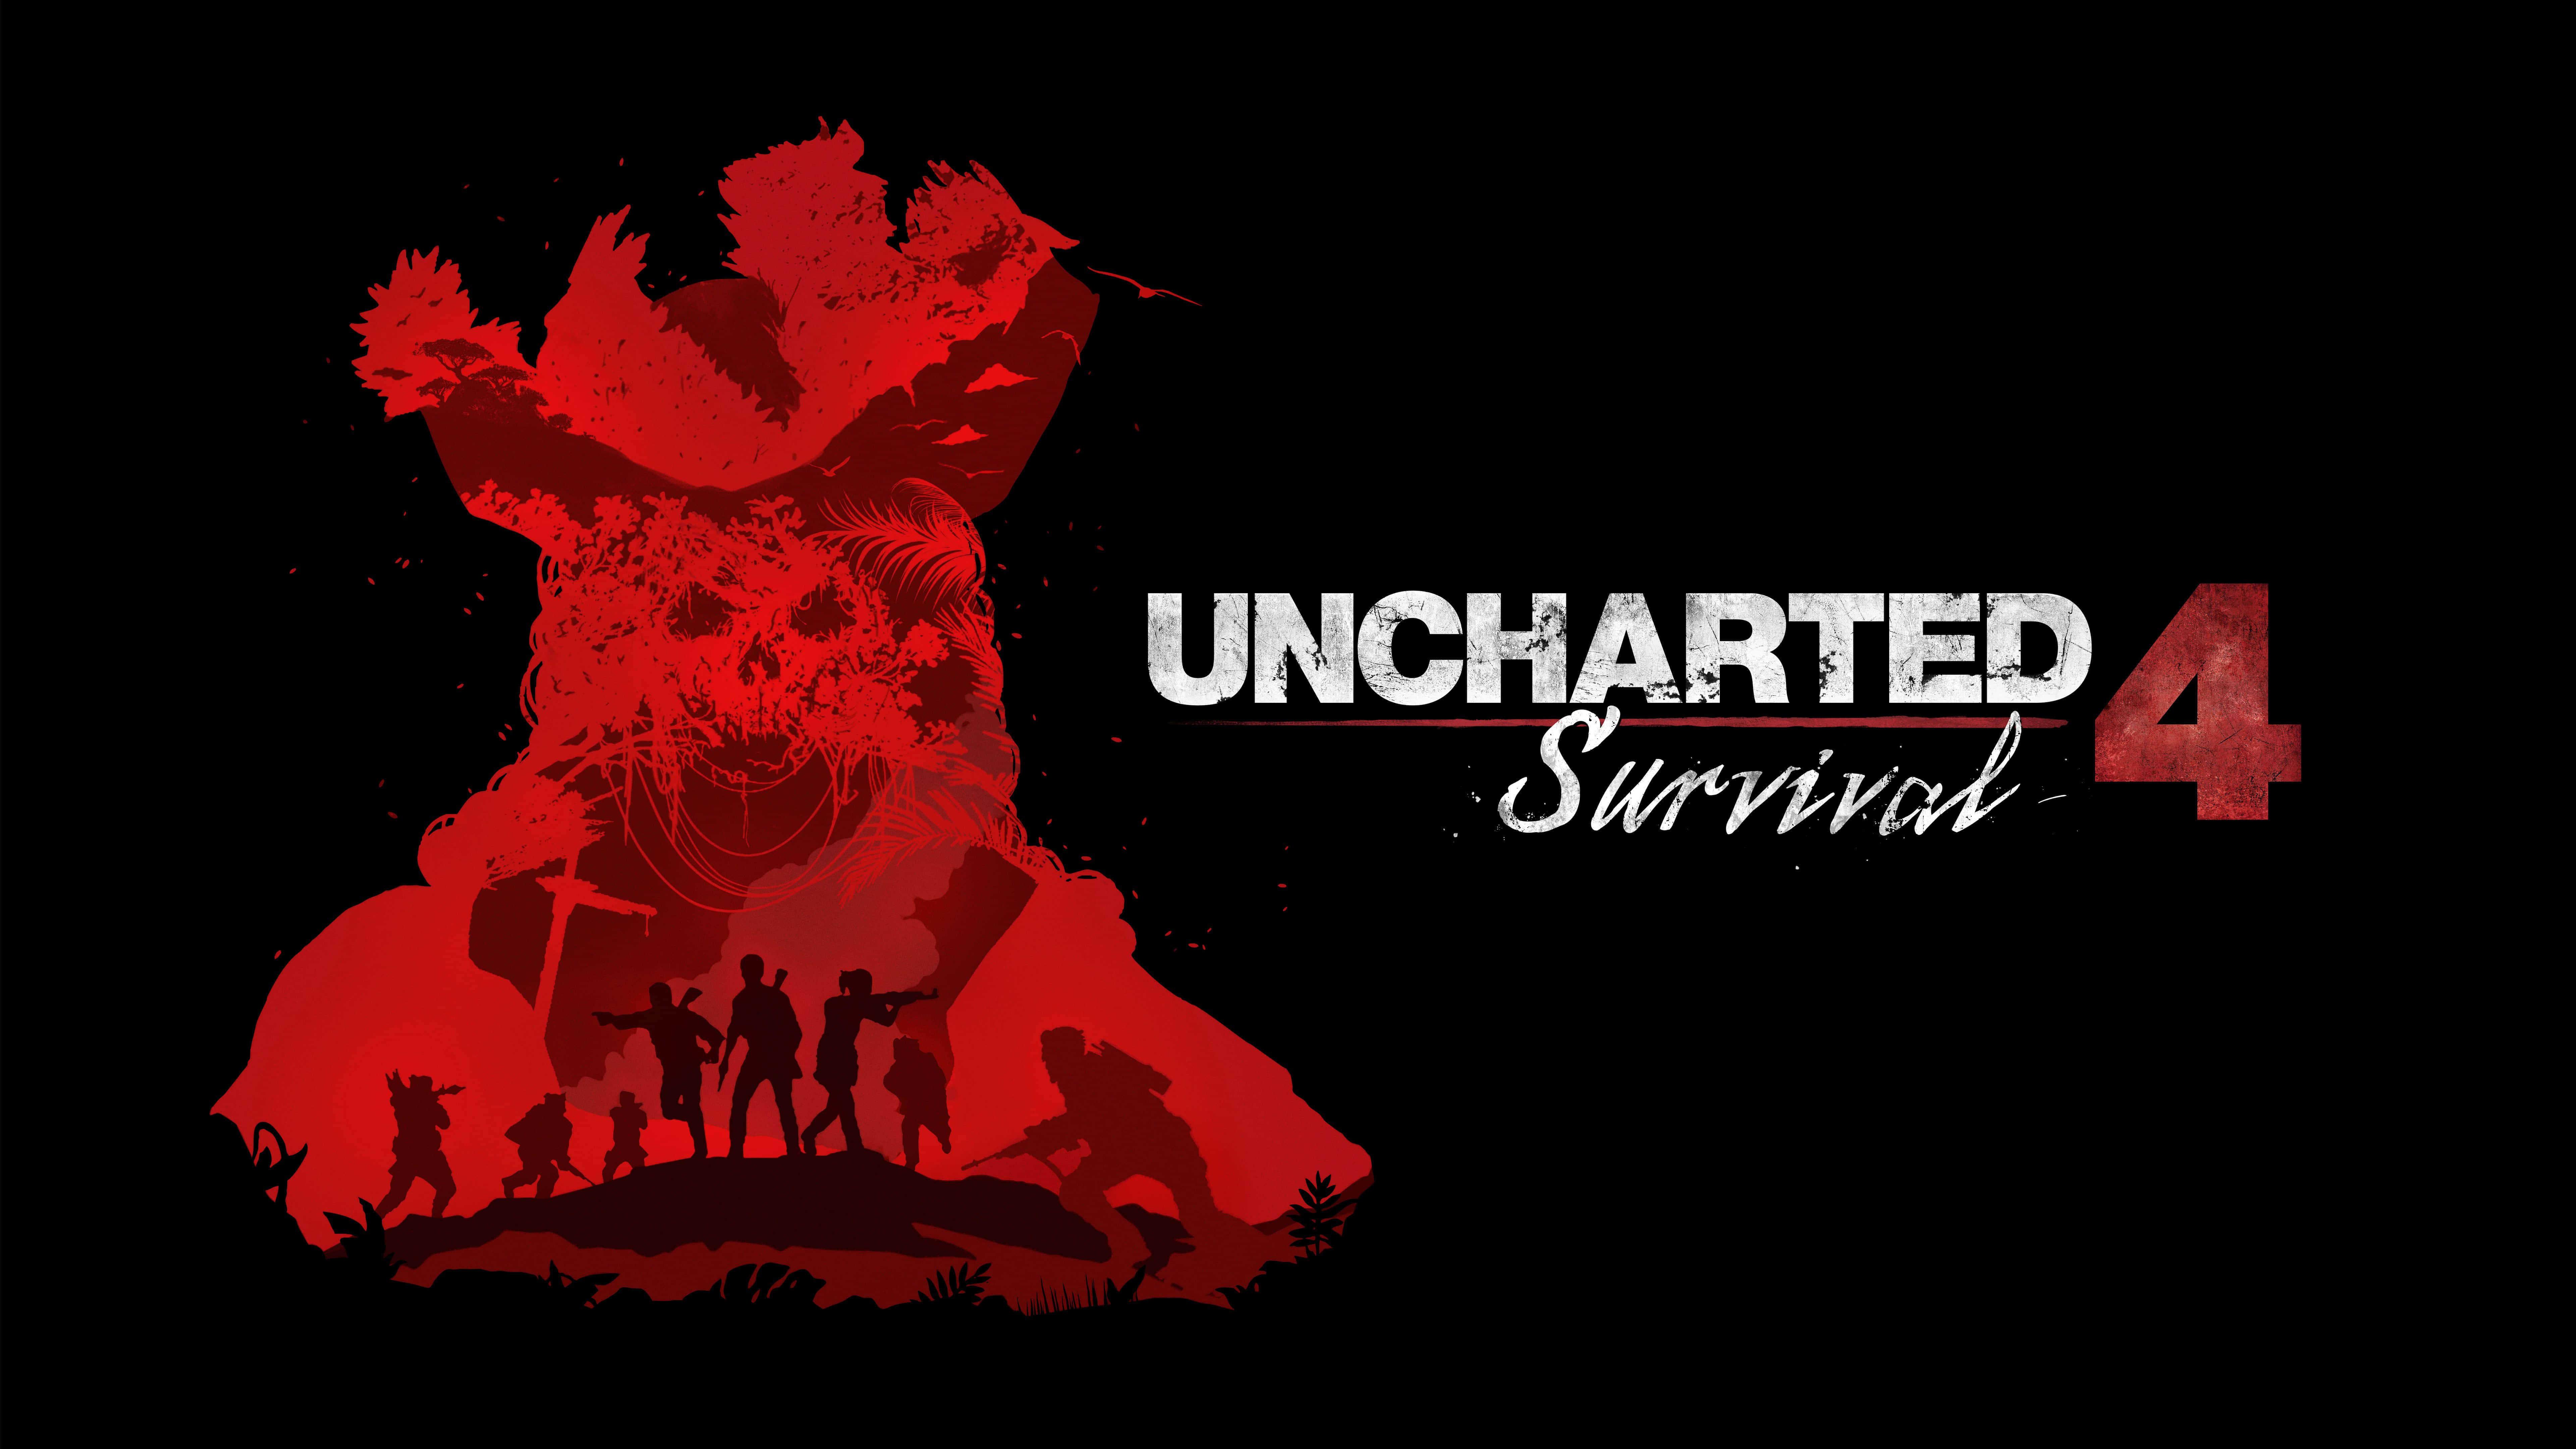 uncharted 4 survival uhd 8k wallpaper